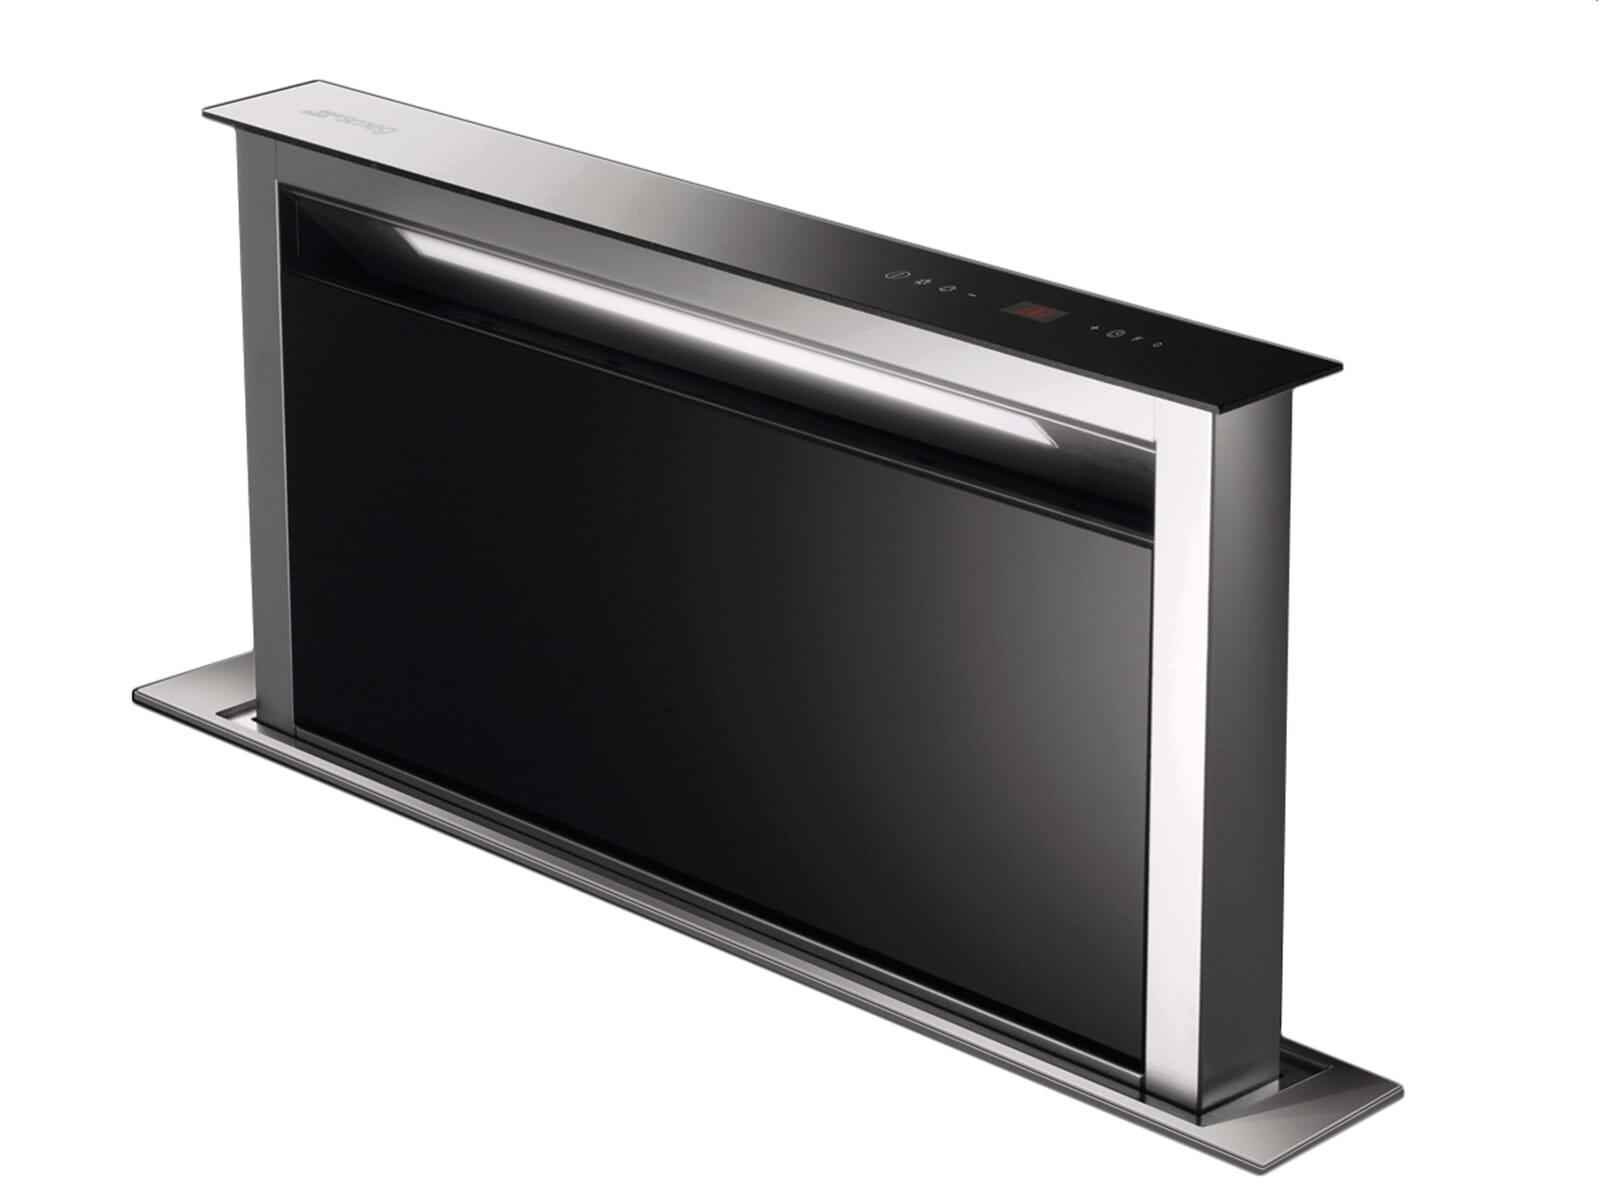 smeg kdd90vxe tisch dunstabzugshaube schwarz muldenl fter. Black Bedroom Furniture Sets. Home Design Ideas